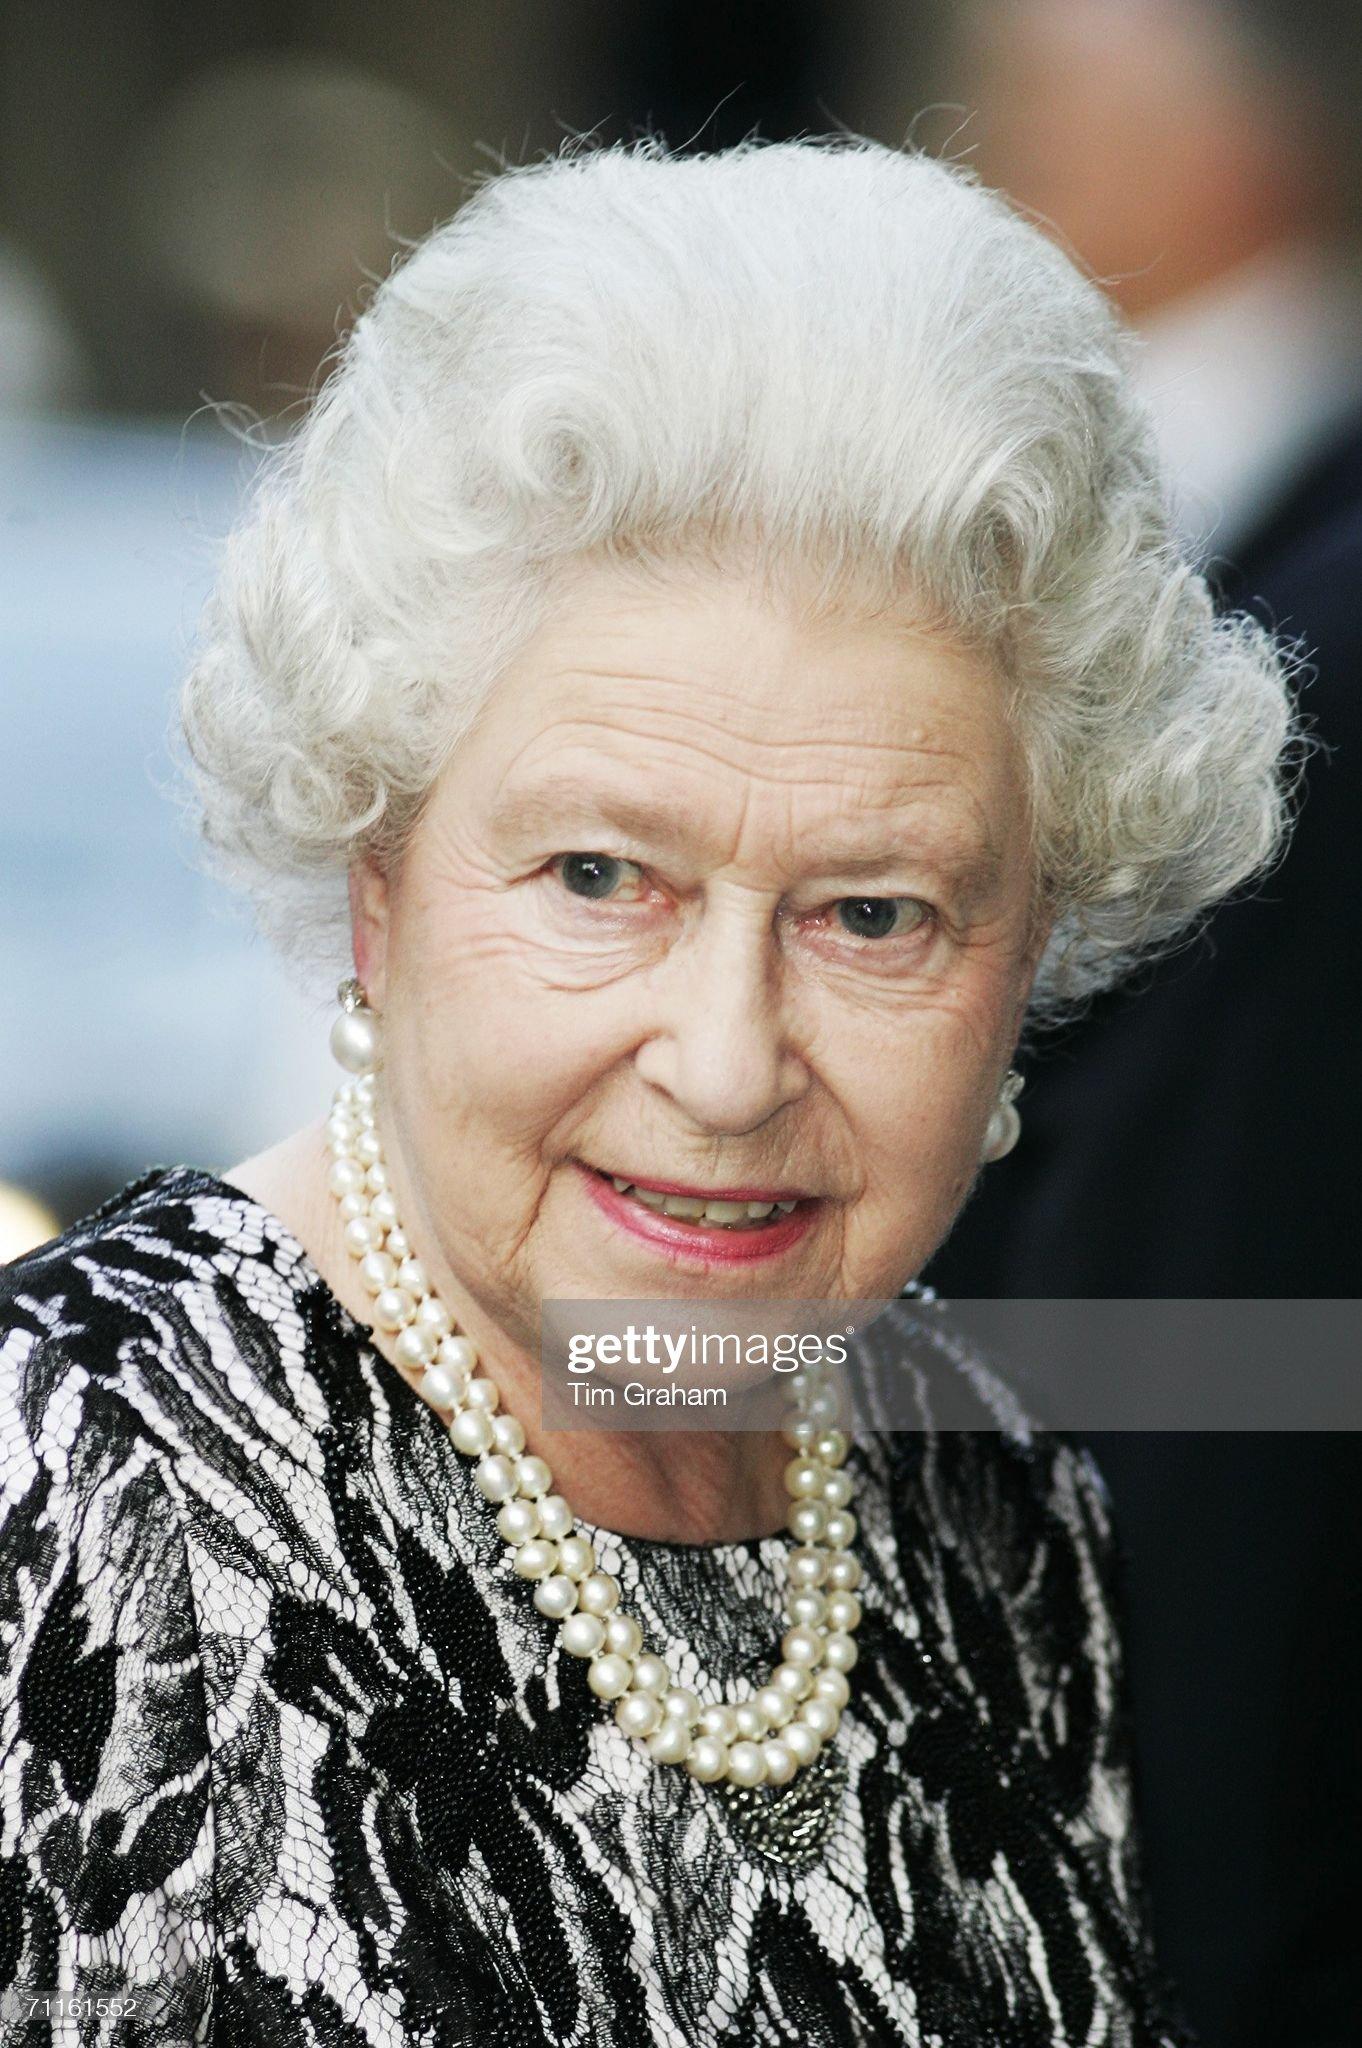 Queen Elizabeth II Attends Royal Opera House Gala : News Photo